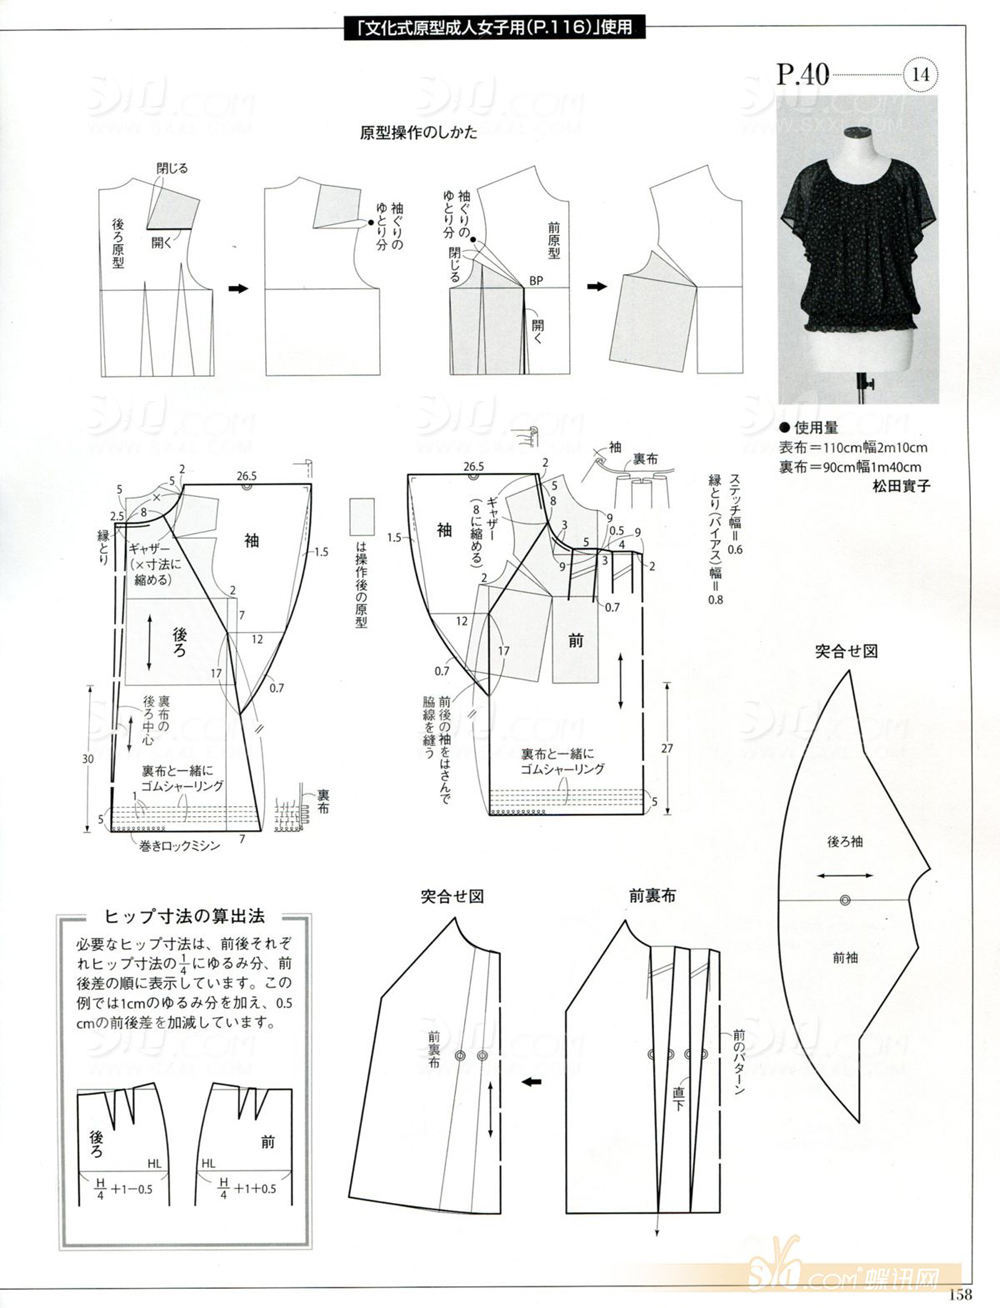 Выкройку Блузки